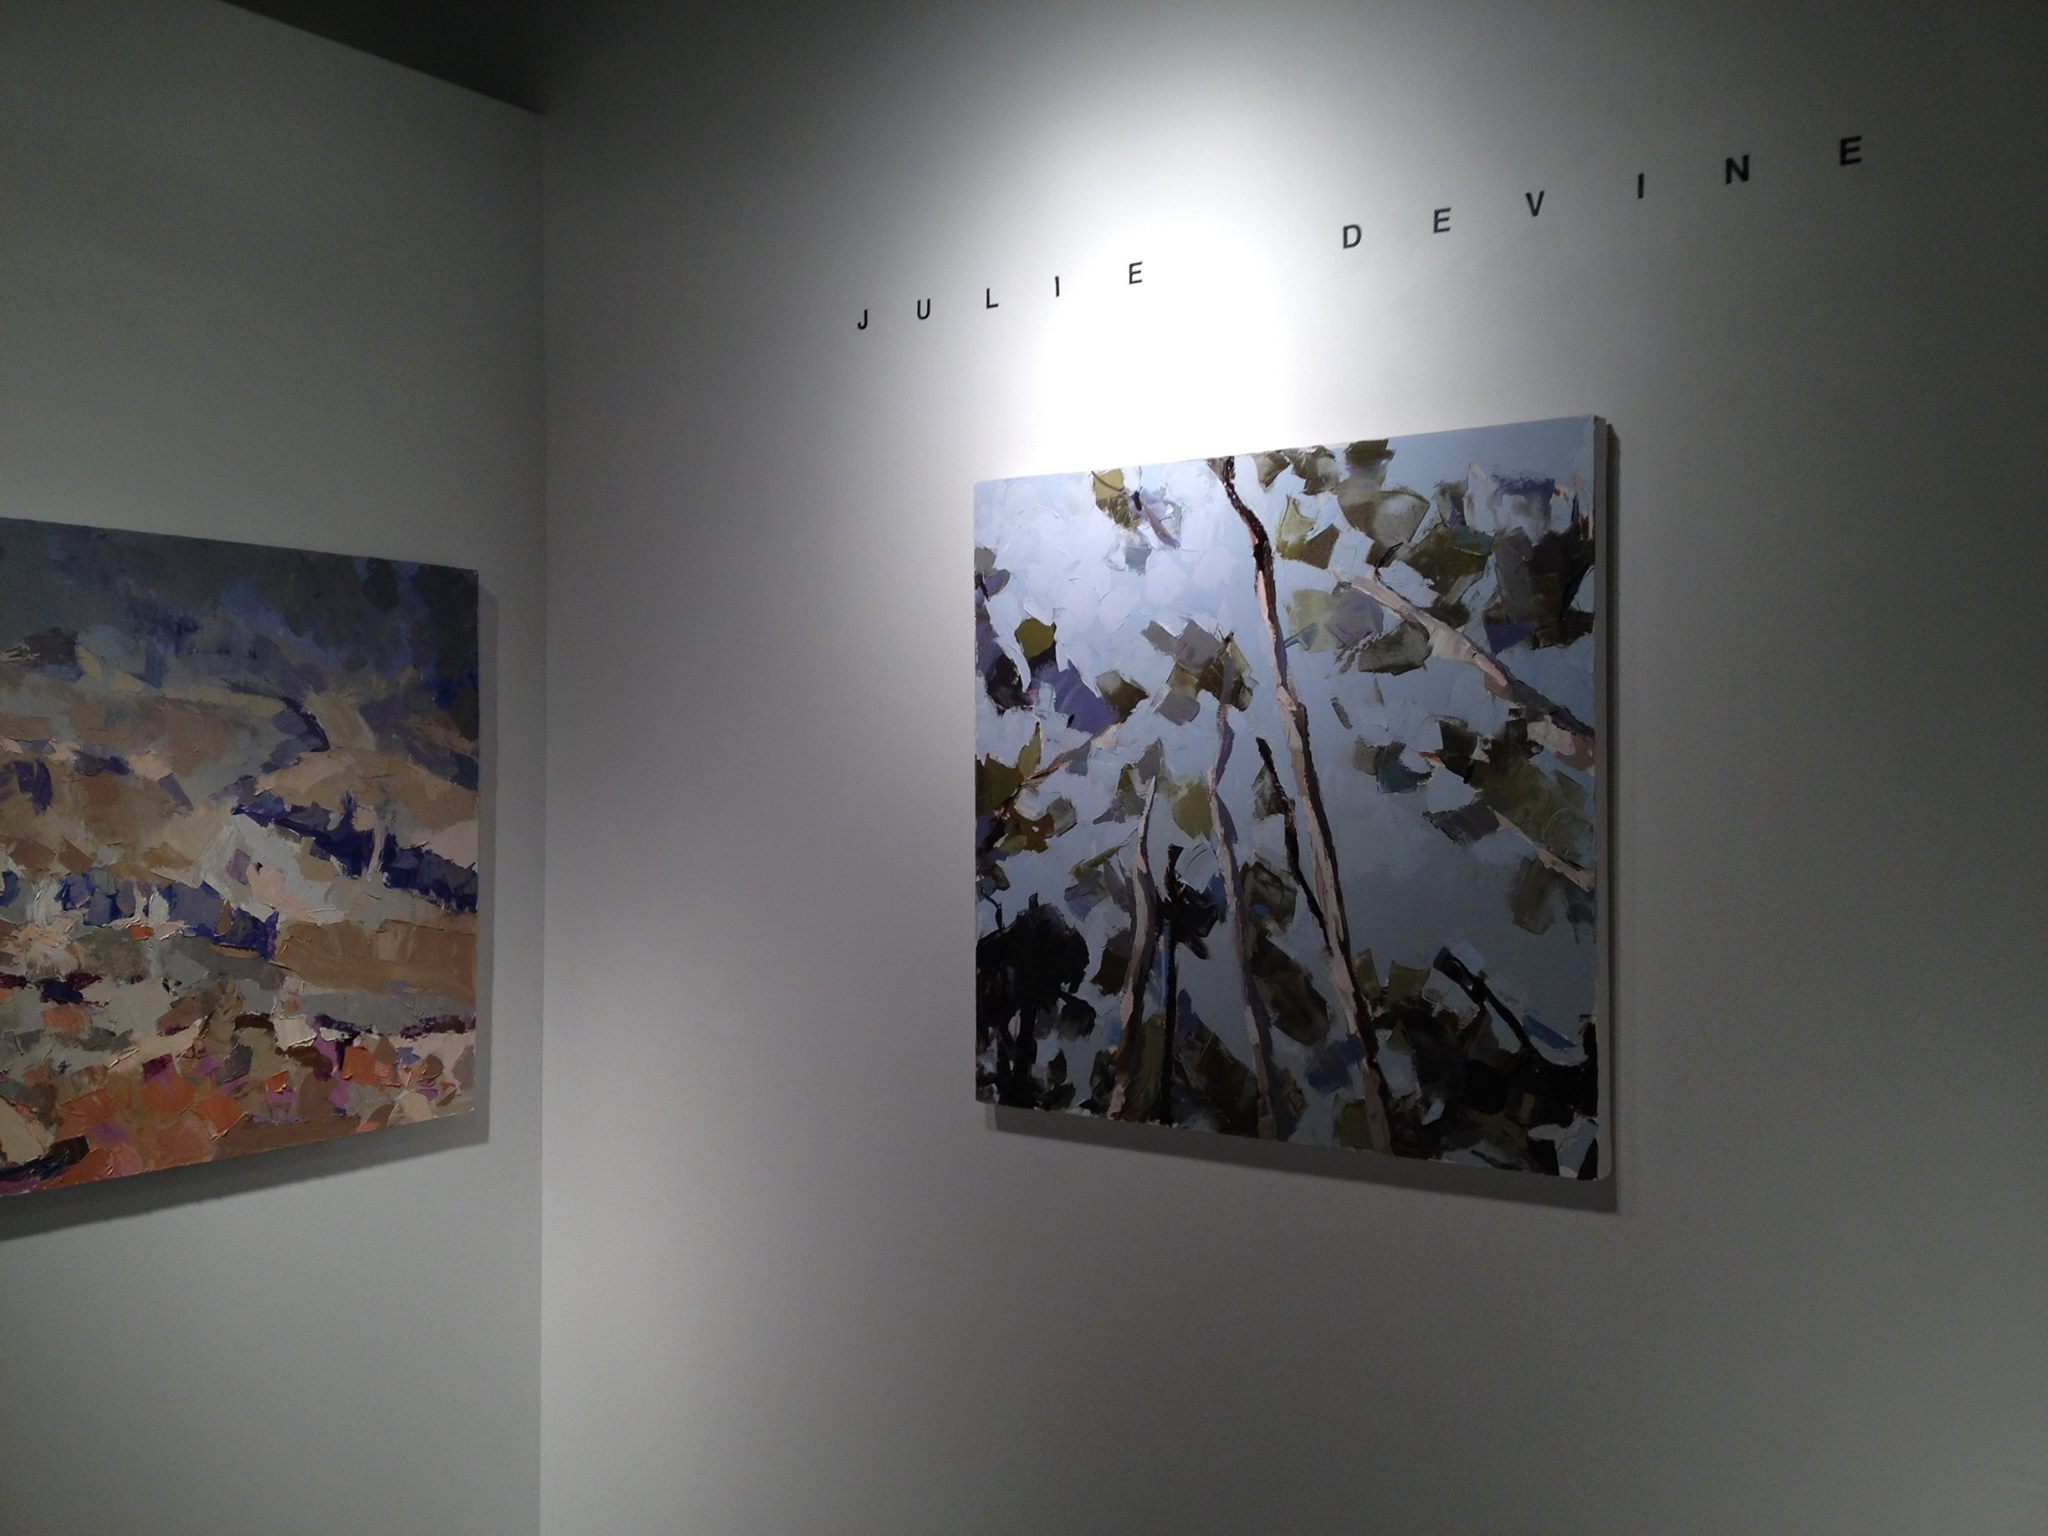 Taos Sky  and  Mt. Saint Helens, Territorial View  at Kate Alkarni Gallery.